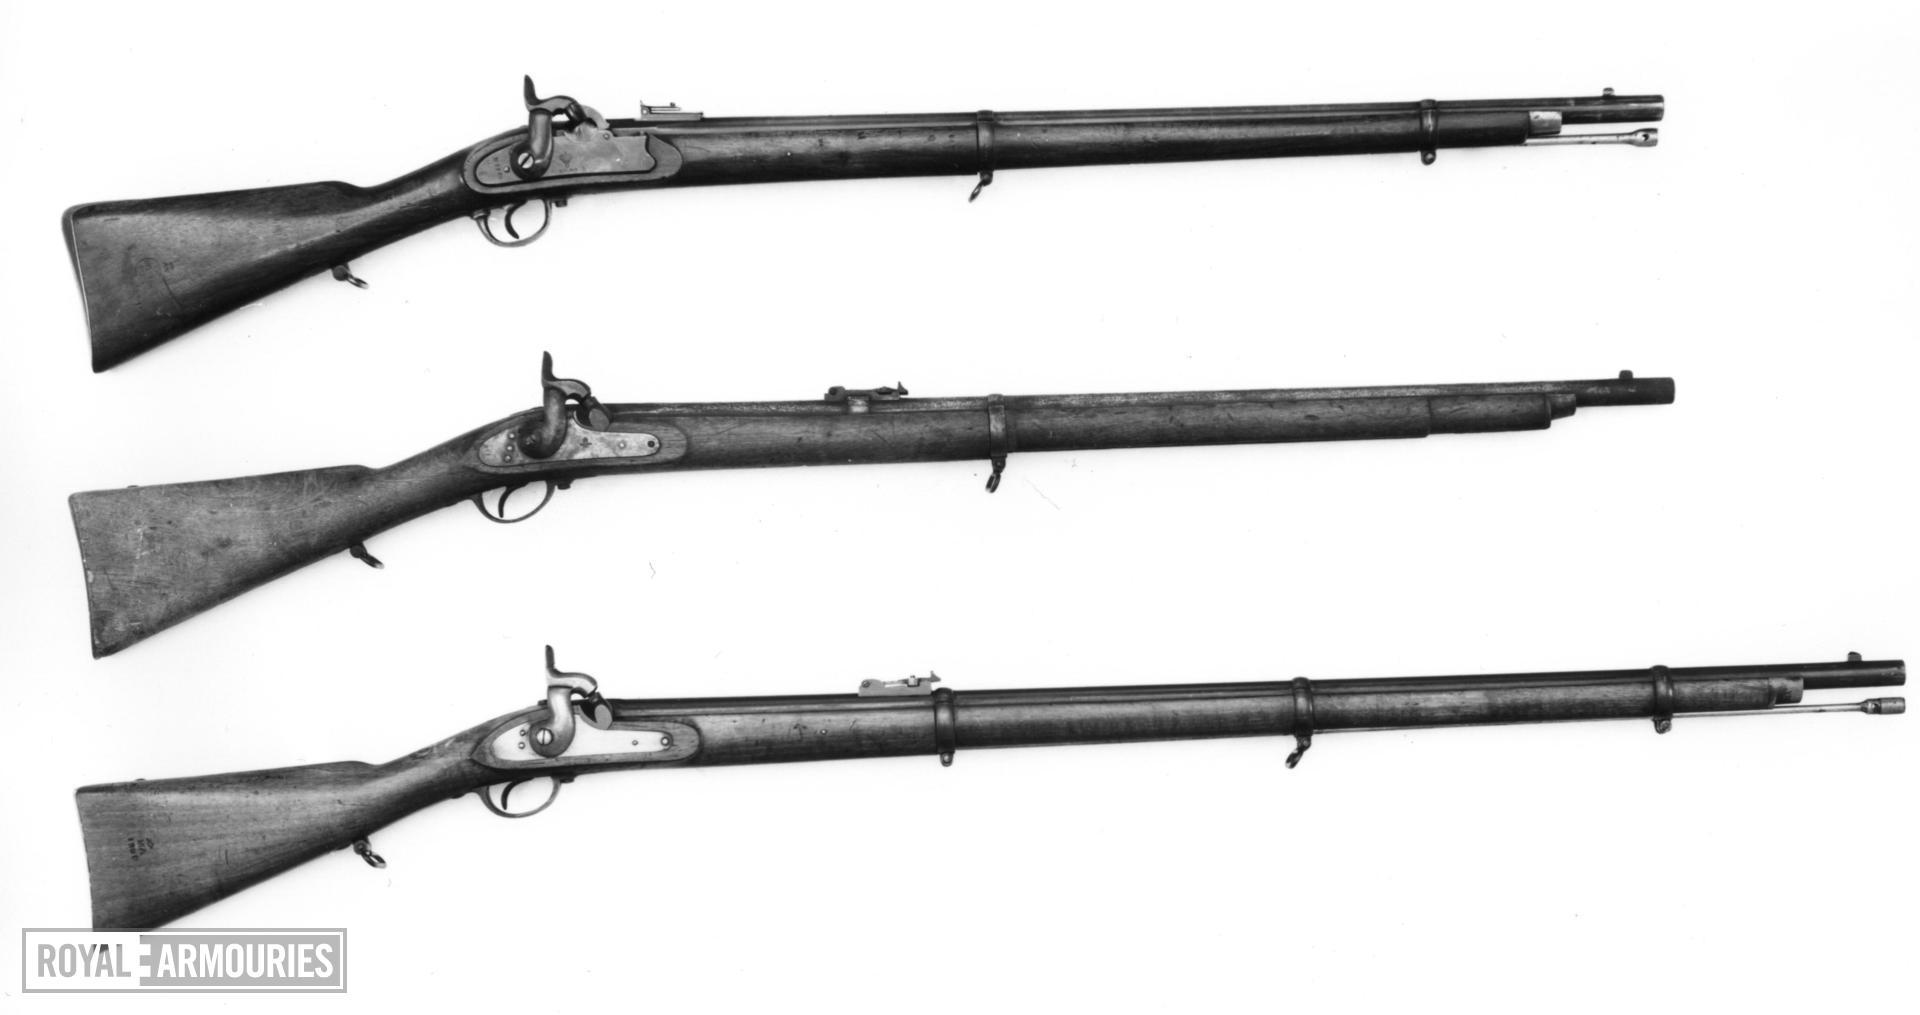 Percussion rifle - Model 1855